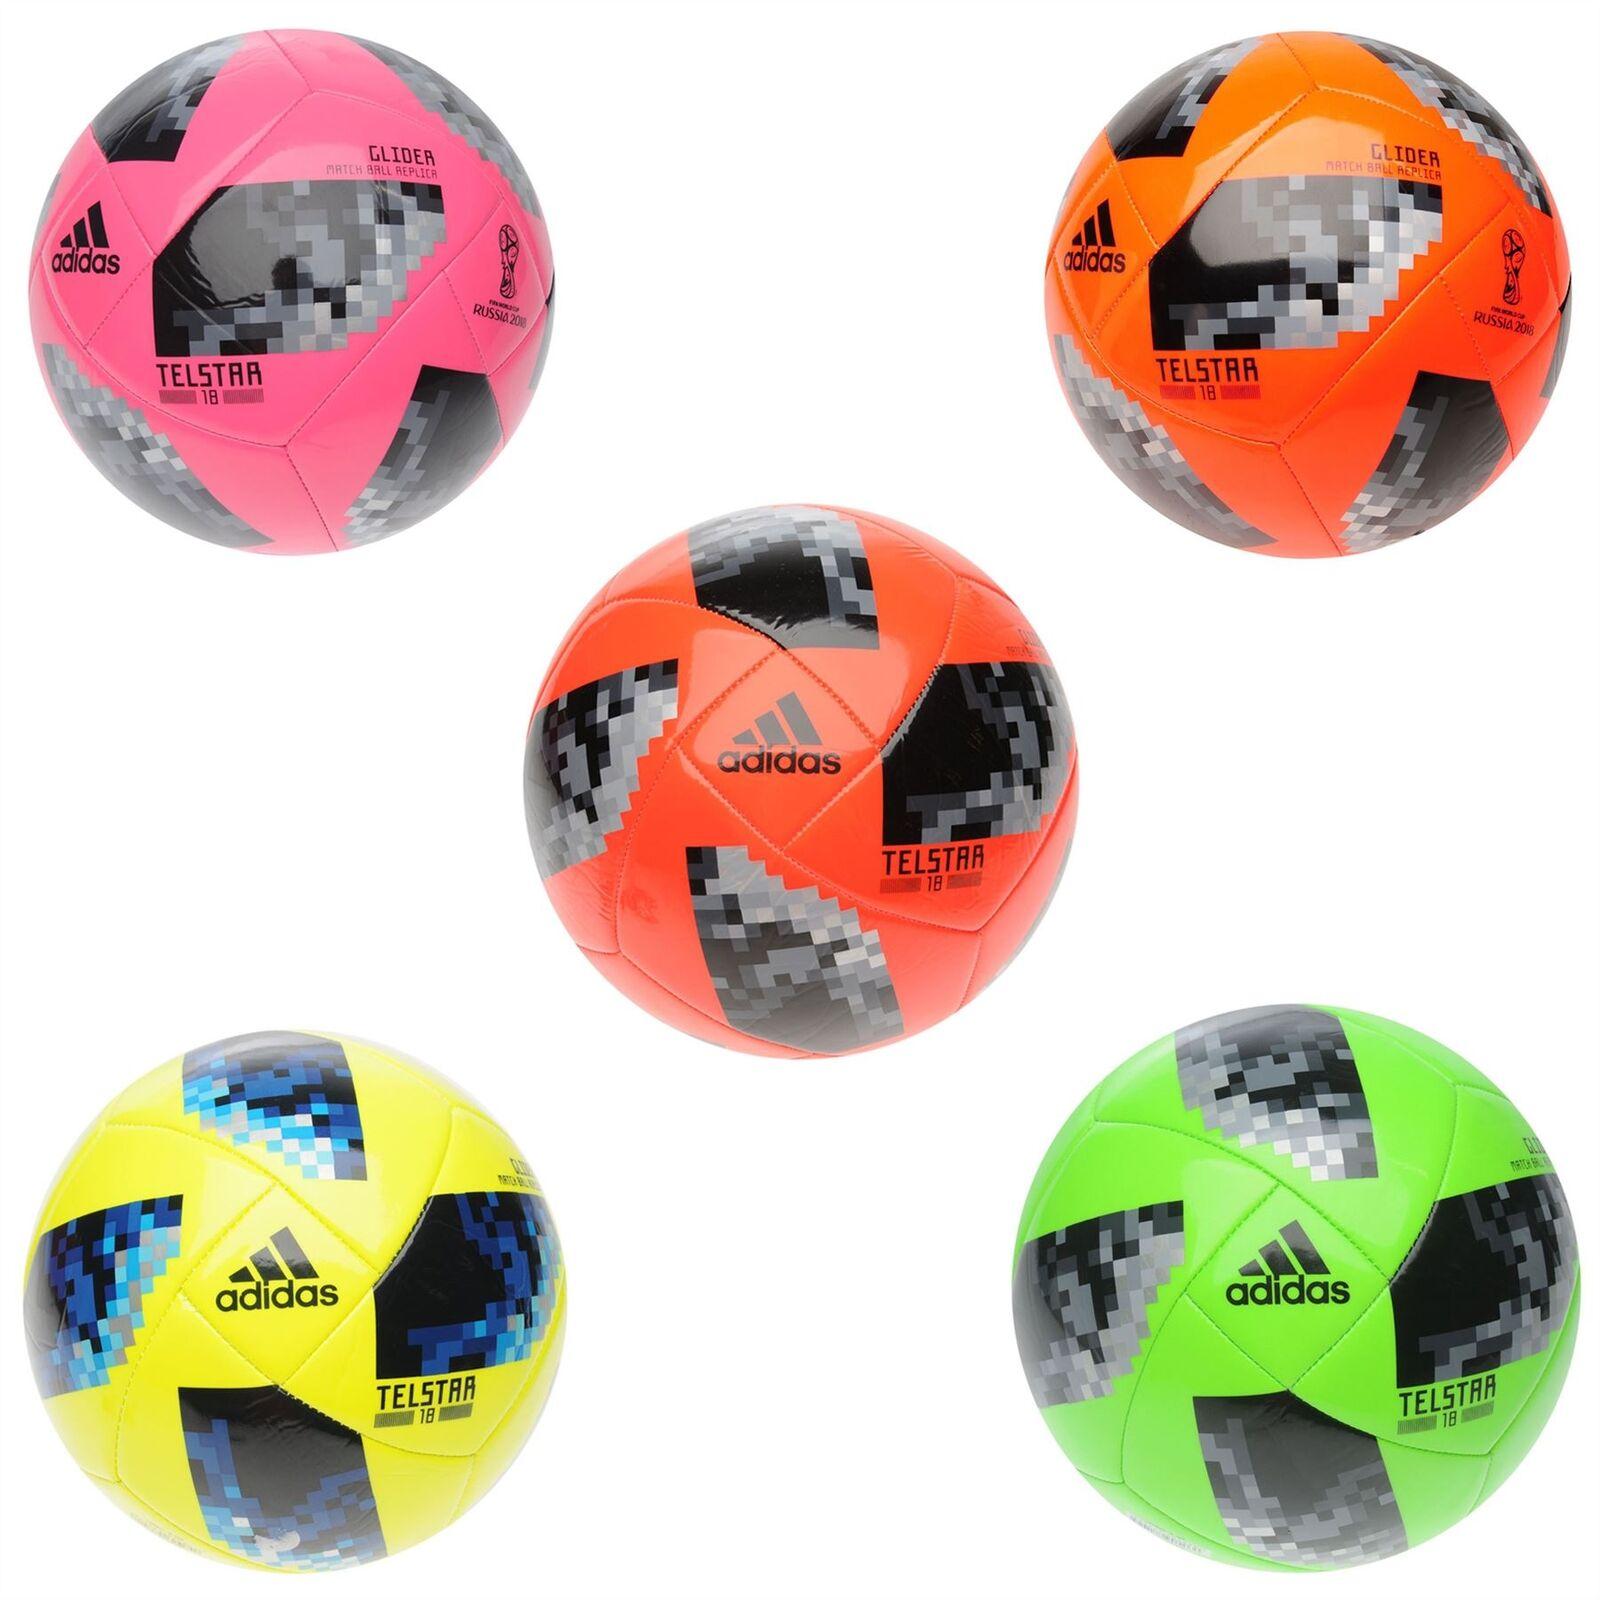 Adidas World Cup Russia 2018 Telstar Glider Football Soccer Ball